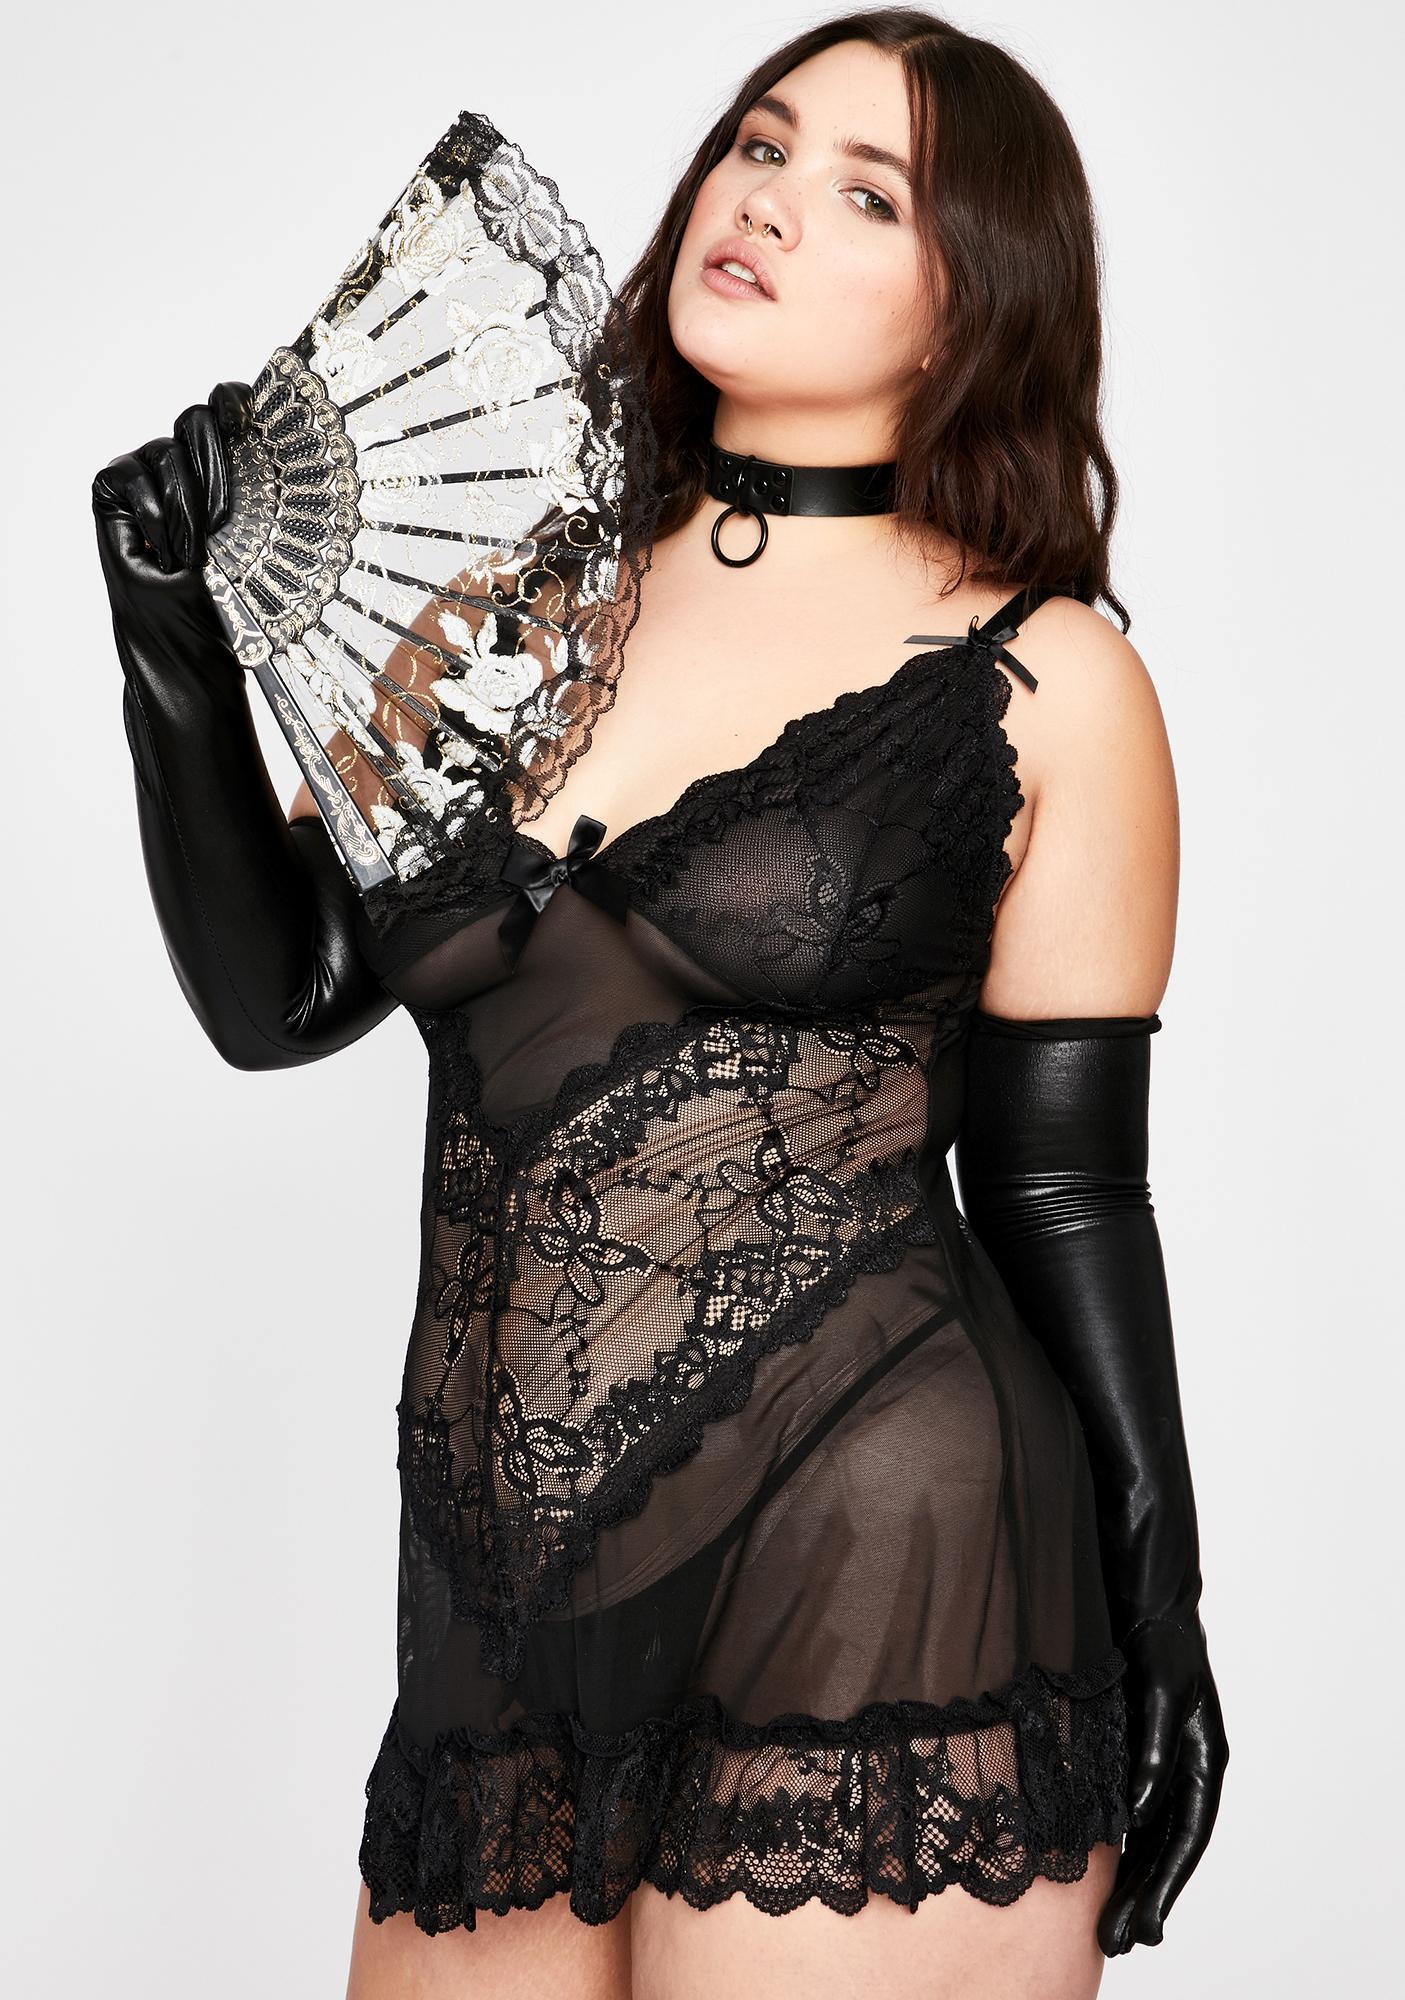 Oh la la Cheri Dark Lux Valentina Vixen Lace Babydoll